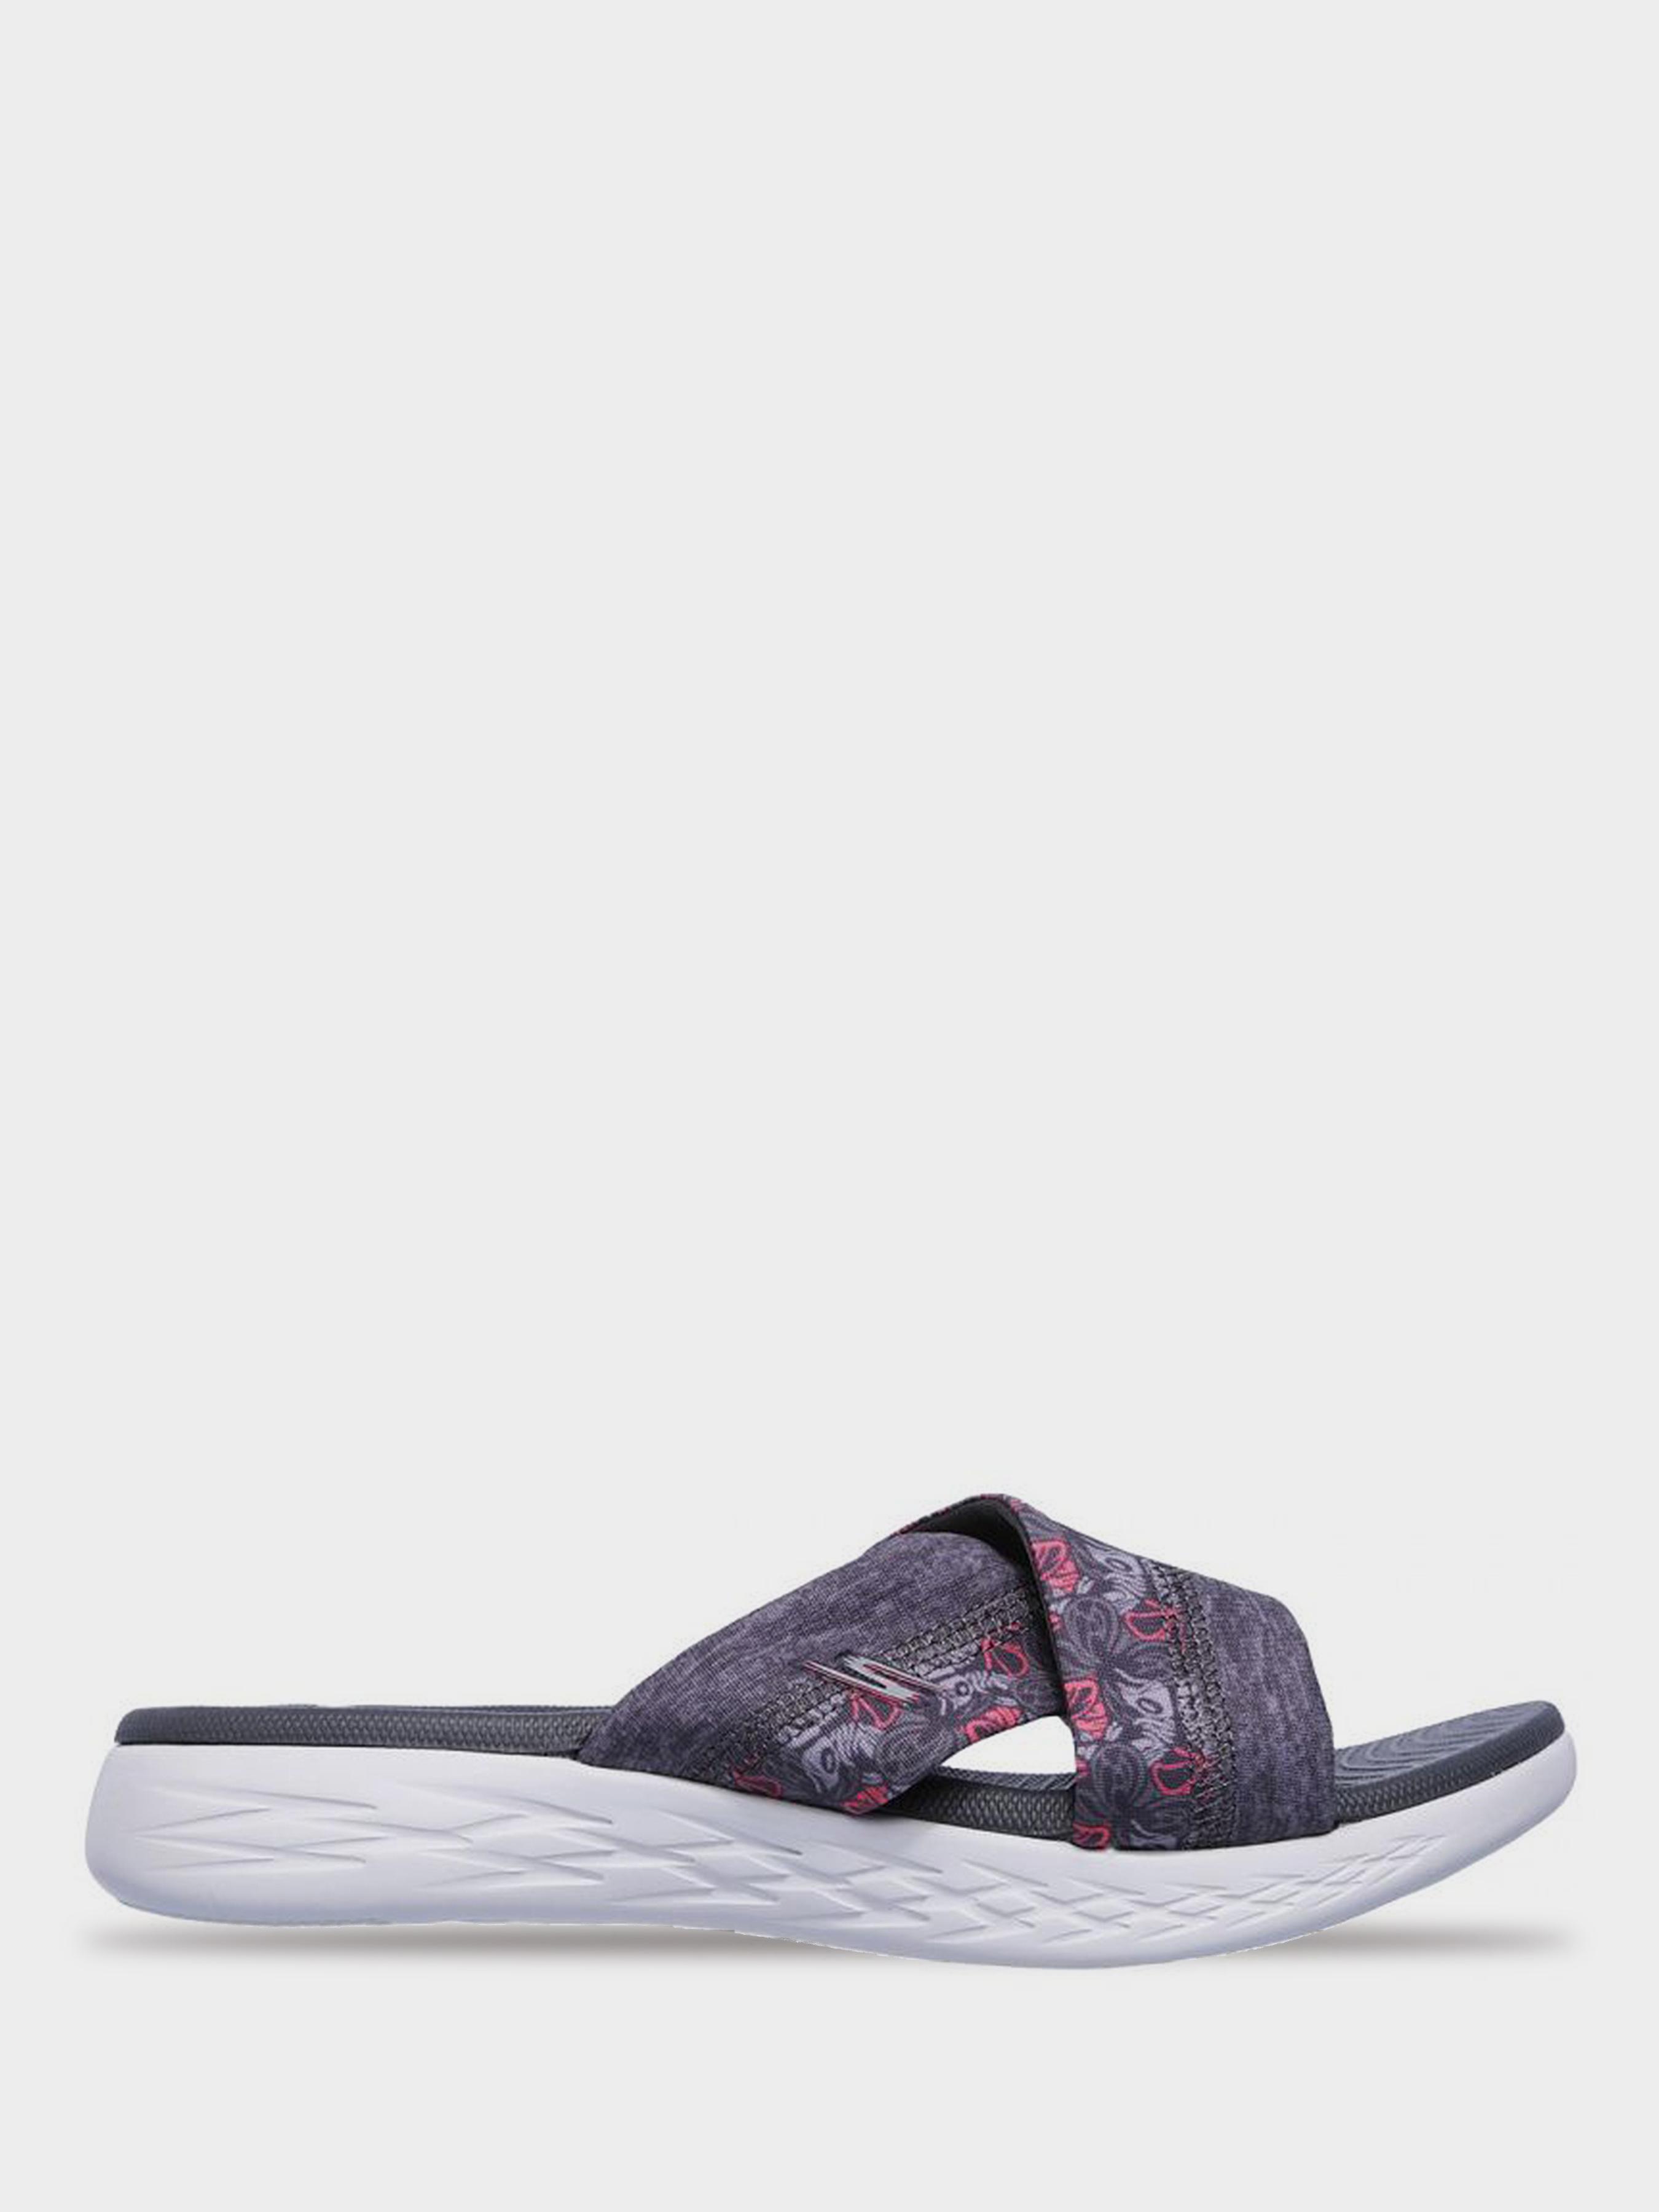 Шлёпанцы для женщин Skechers KW5100 размеры обуви, 2017